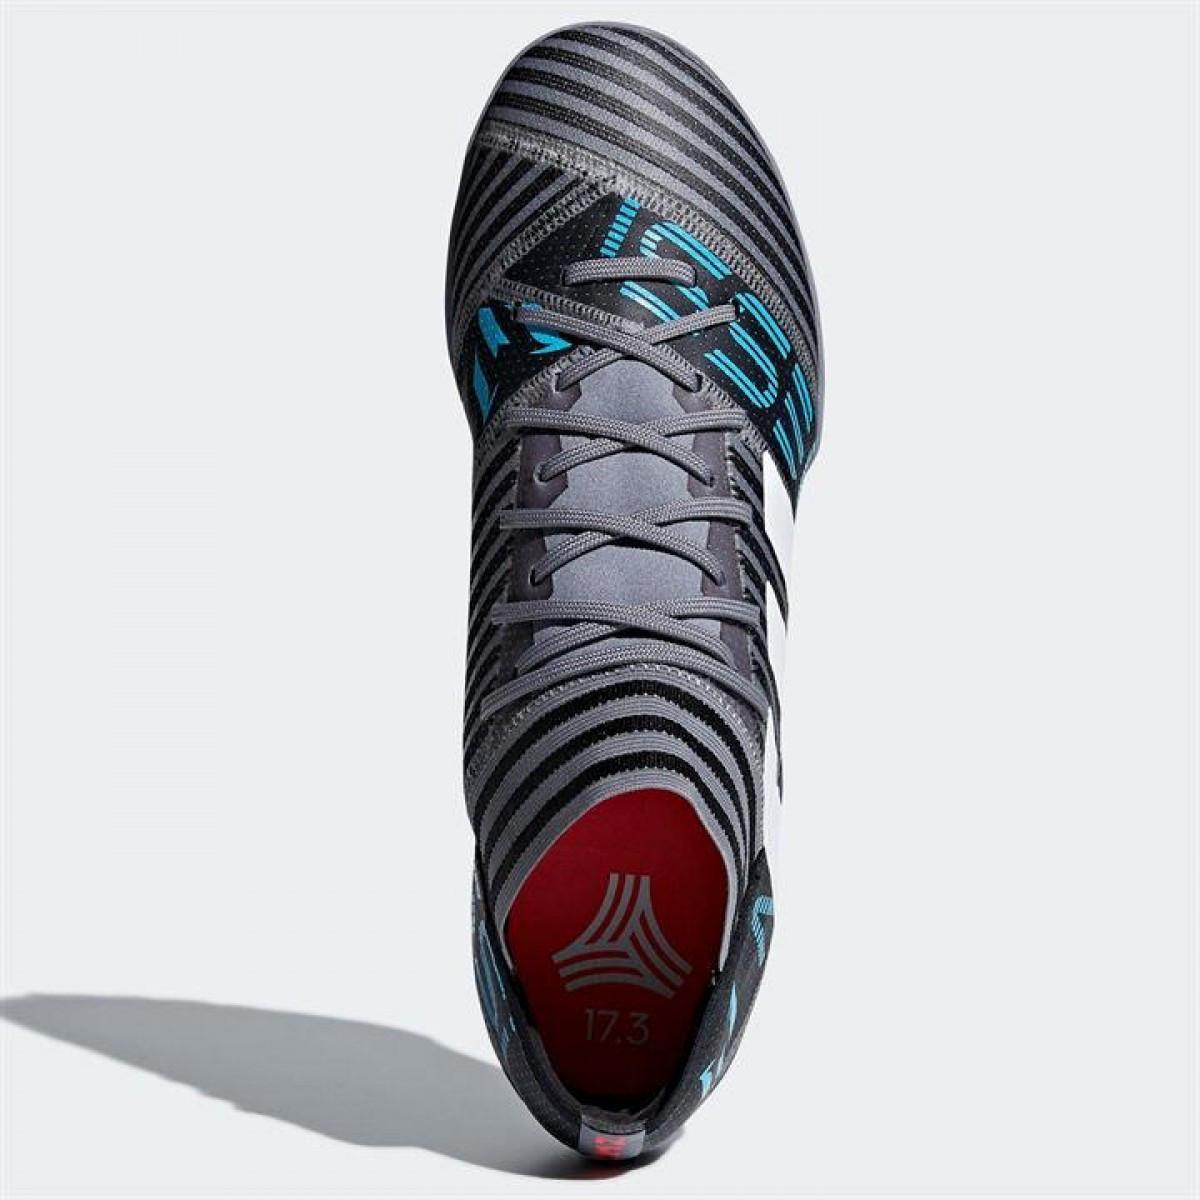 ea6ba7c4 Сороконожки adidas Nemeziz Messi Tango 17.3 Astro Turf Grey/White/Blk -  Оригинал, цена 1 799 грн., купить в Луцке — Prom.ua (ID#796433311)